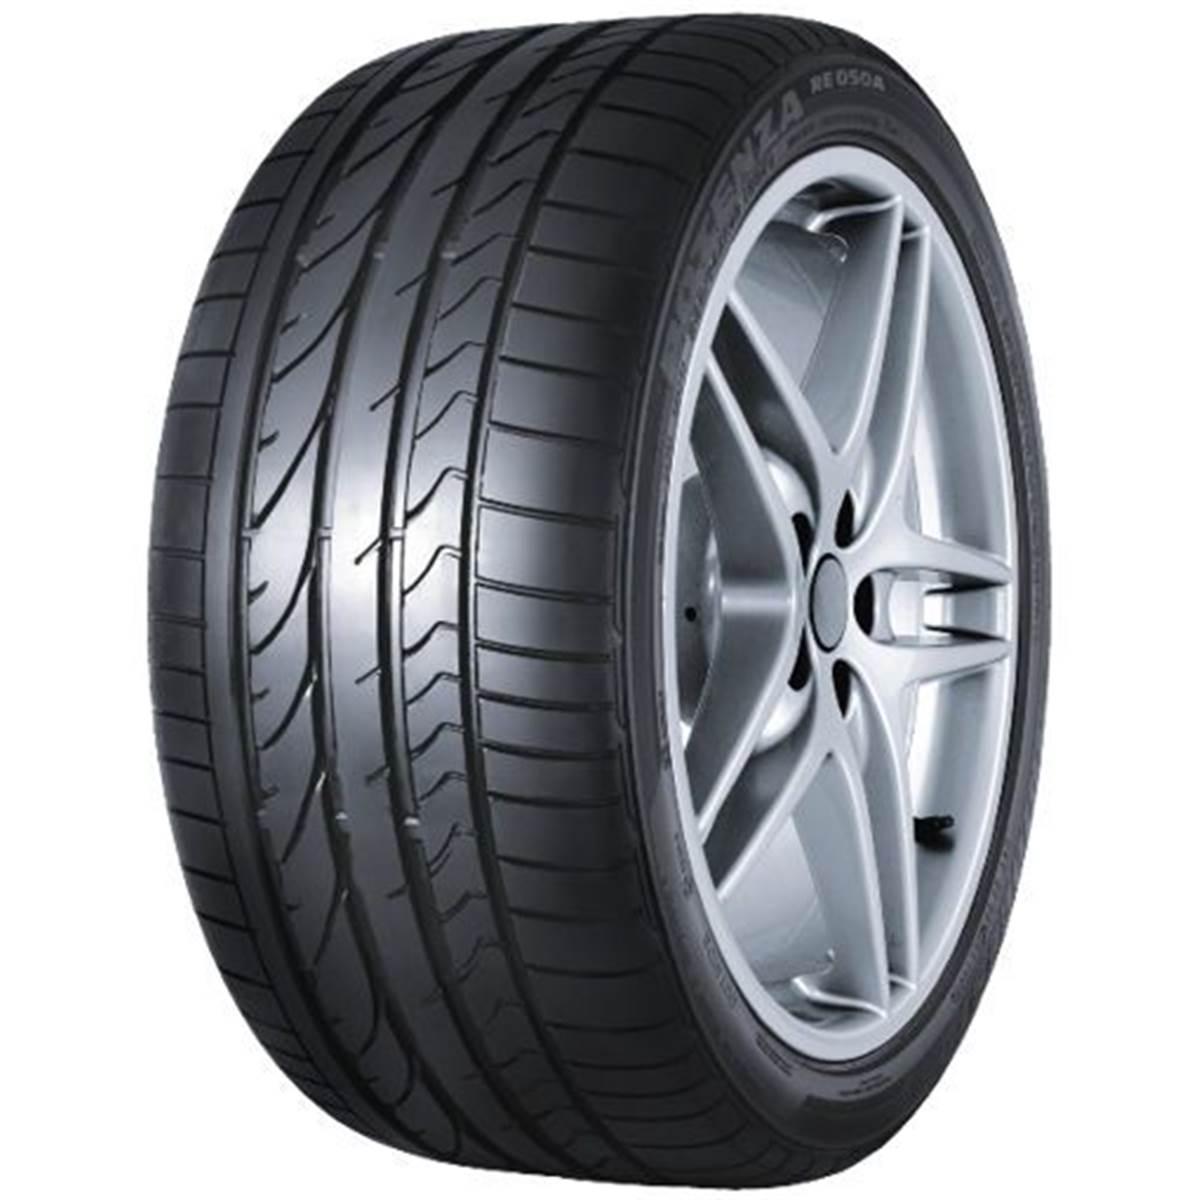 Bridgestone Potenza Re050a I